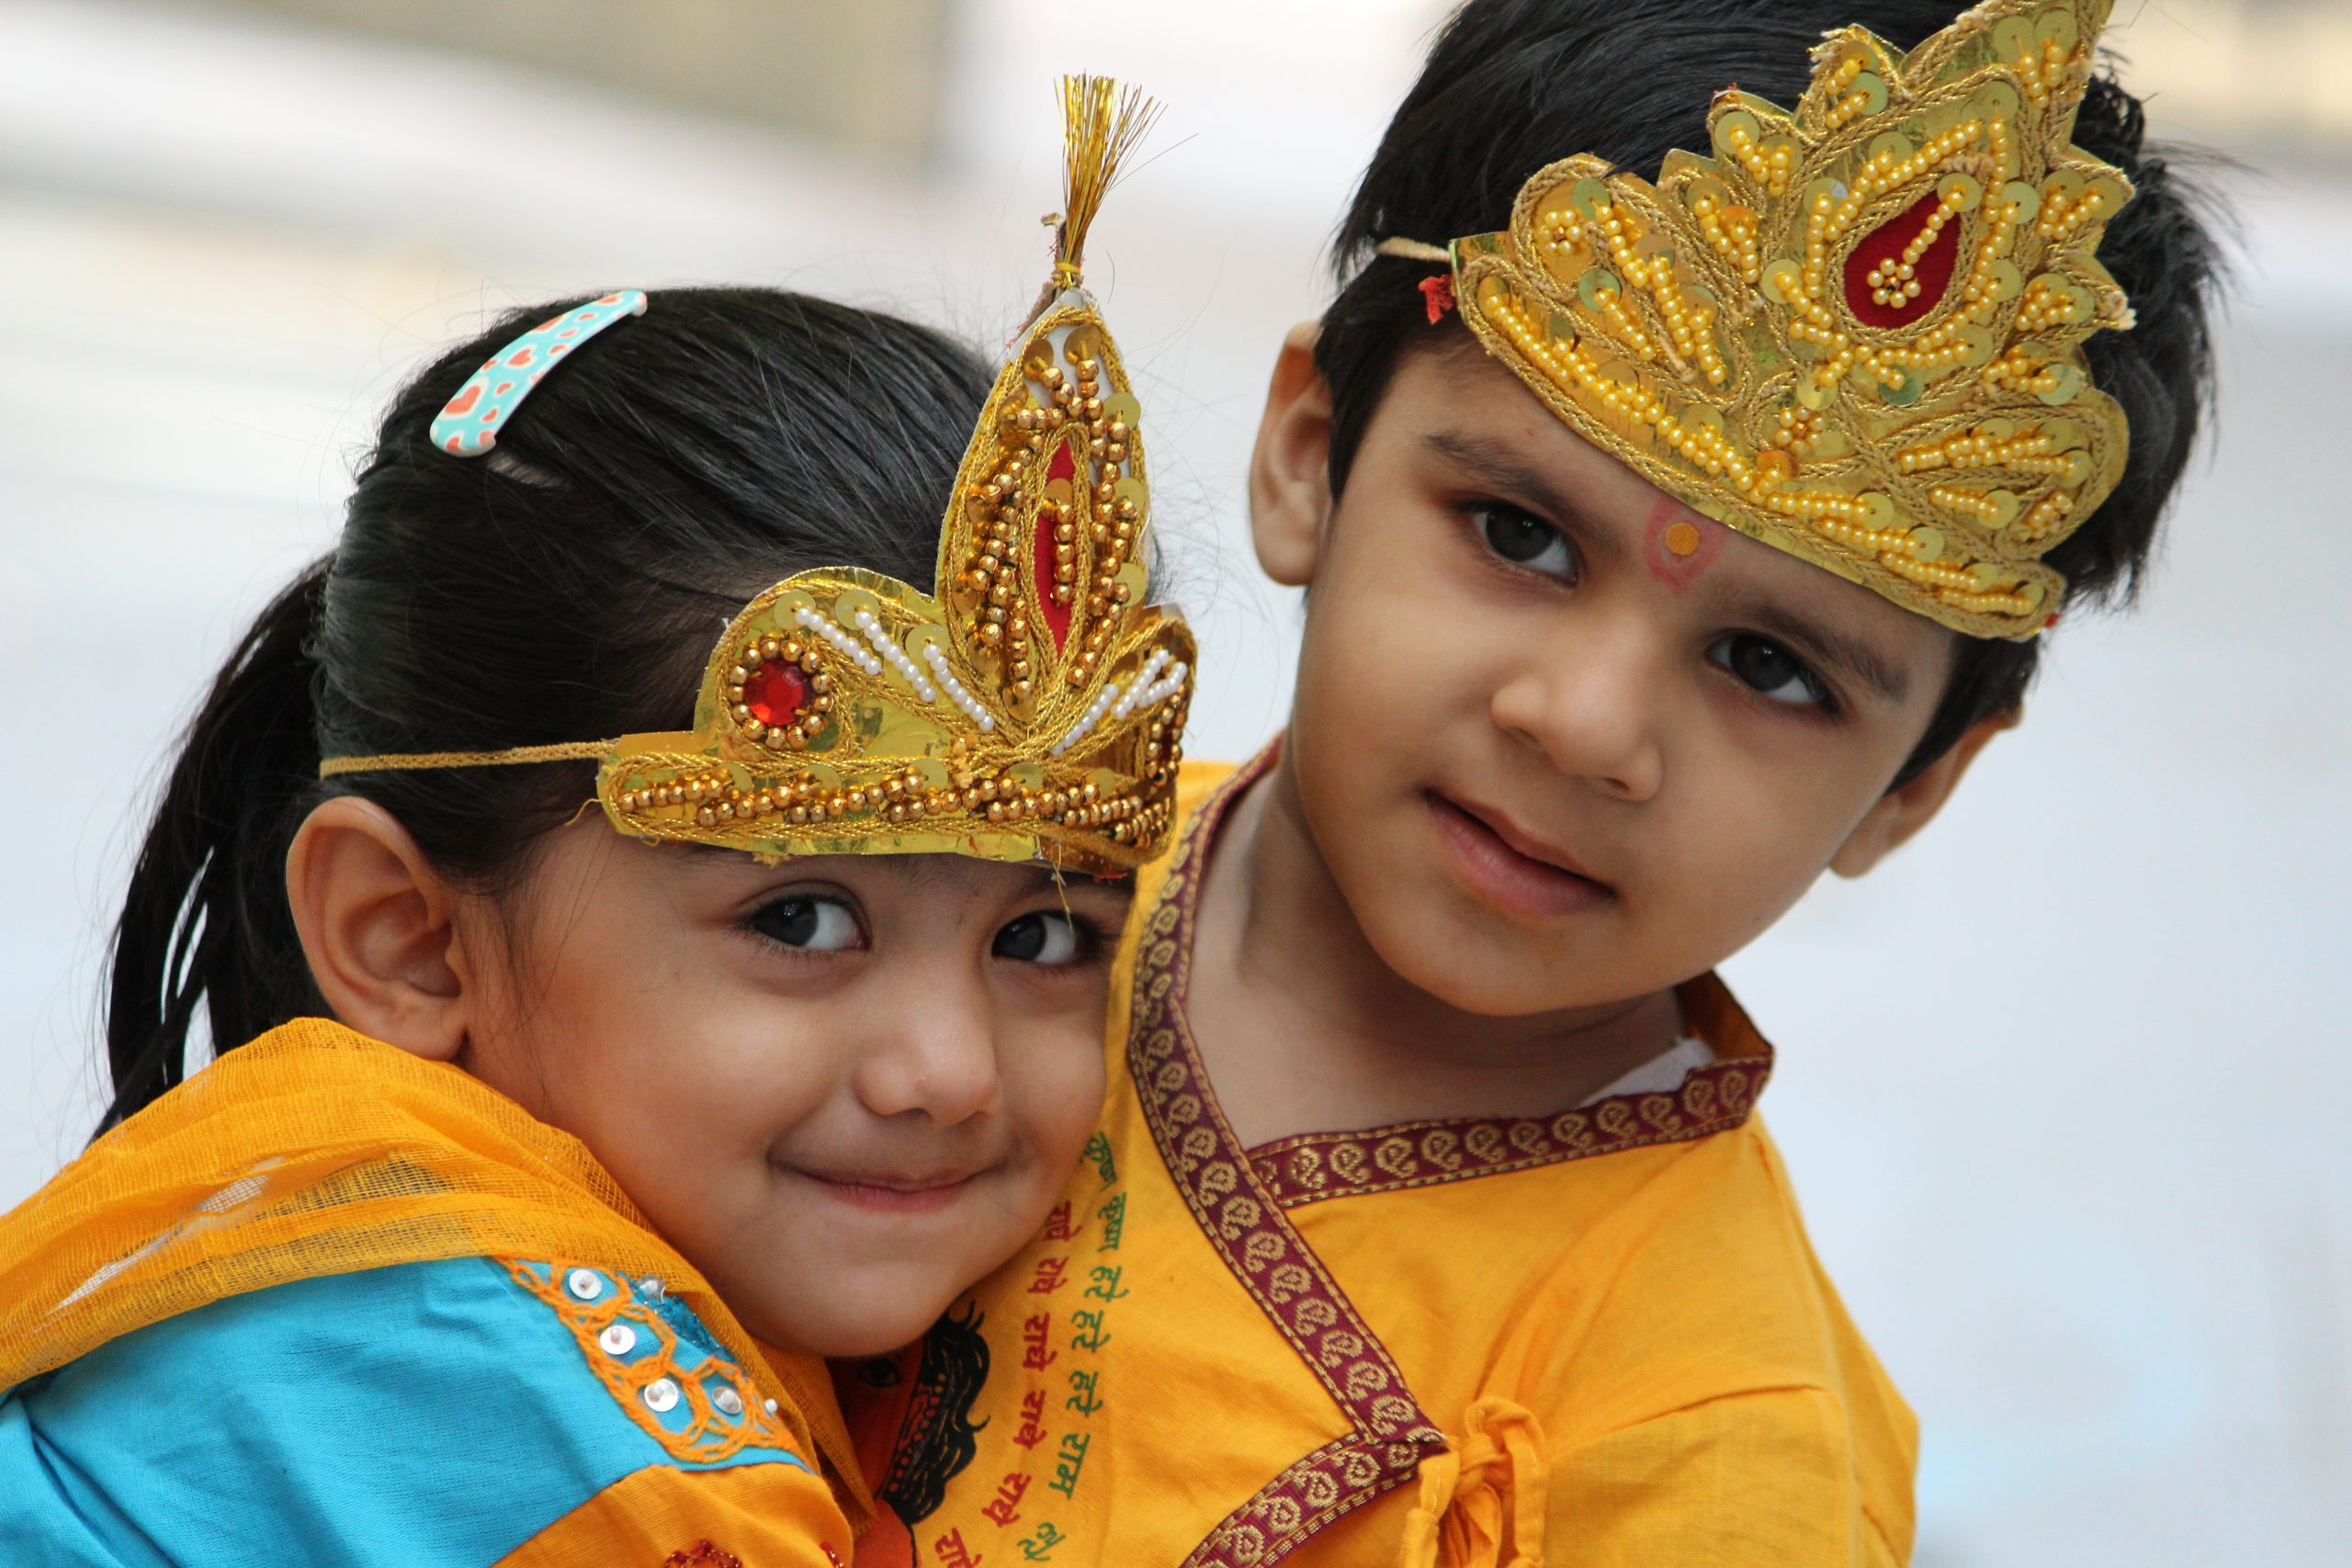 Kids in Radha Krishna costume